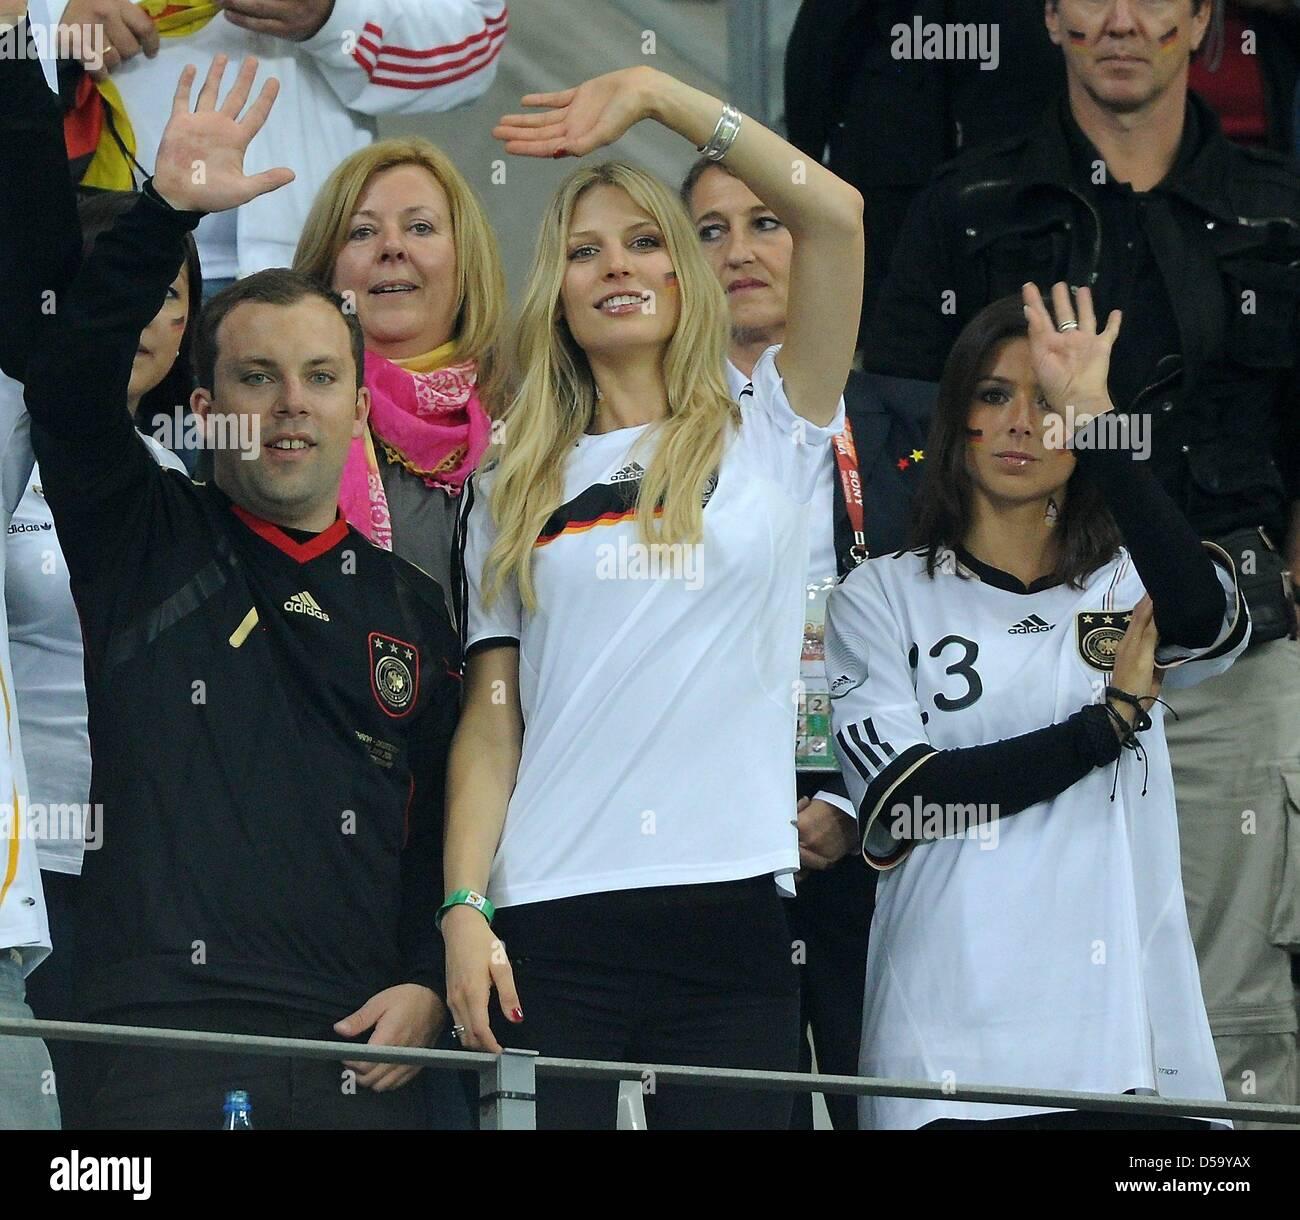 Daniela Loew 2 L Die Ehefrau Des Deutschen Headcoach Joachim Loew